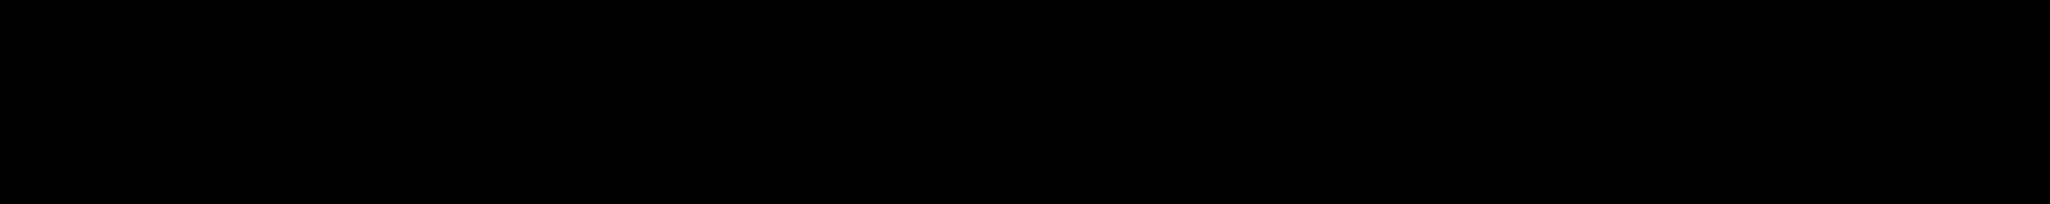 bending-spoons logo